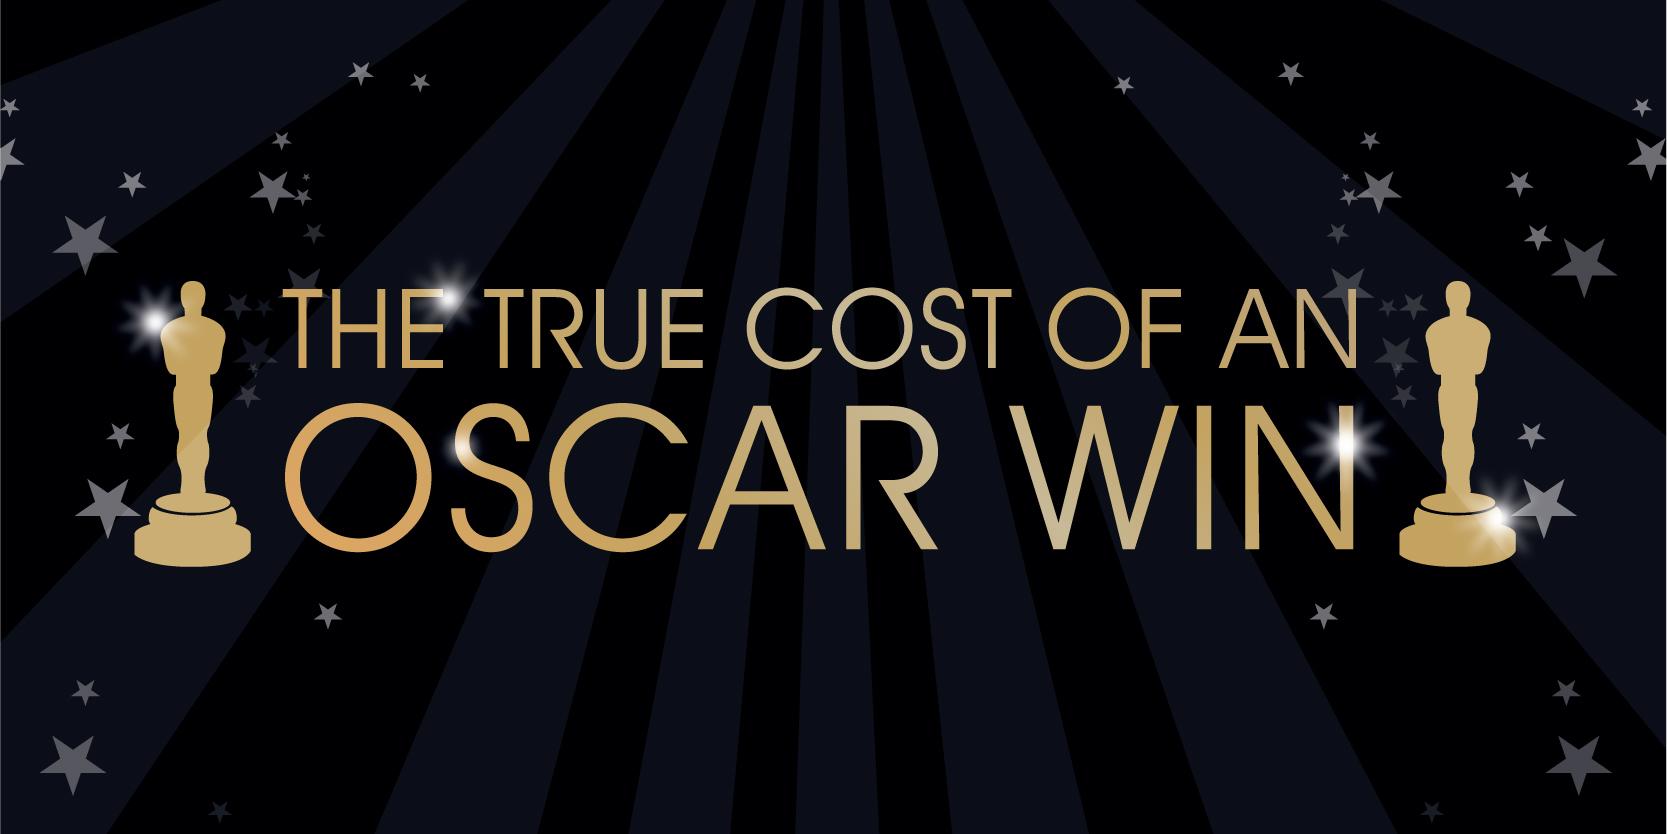 Oscars graphic